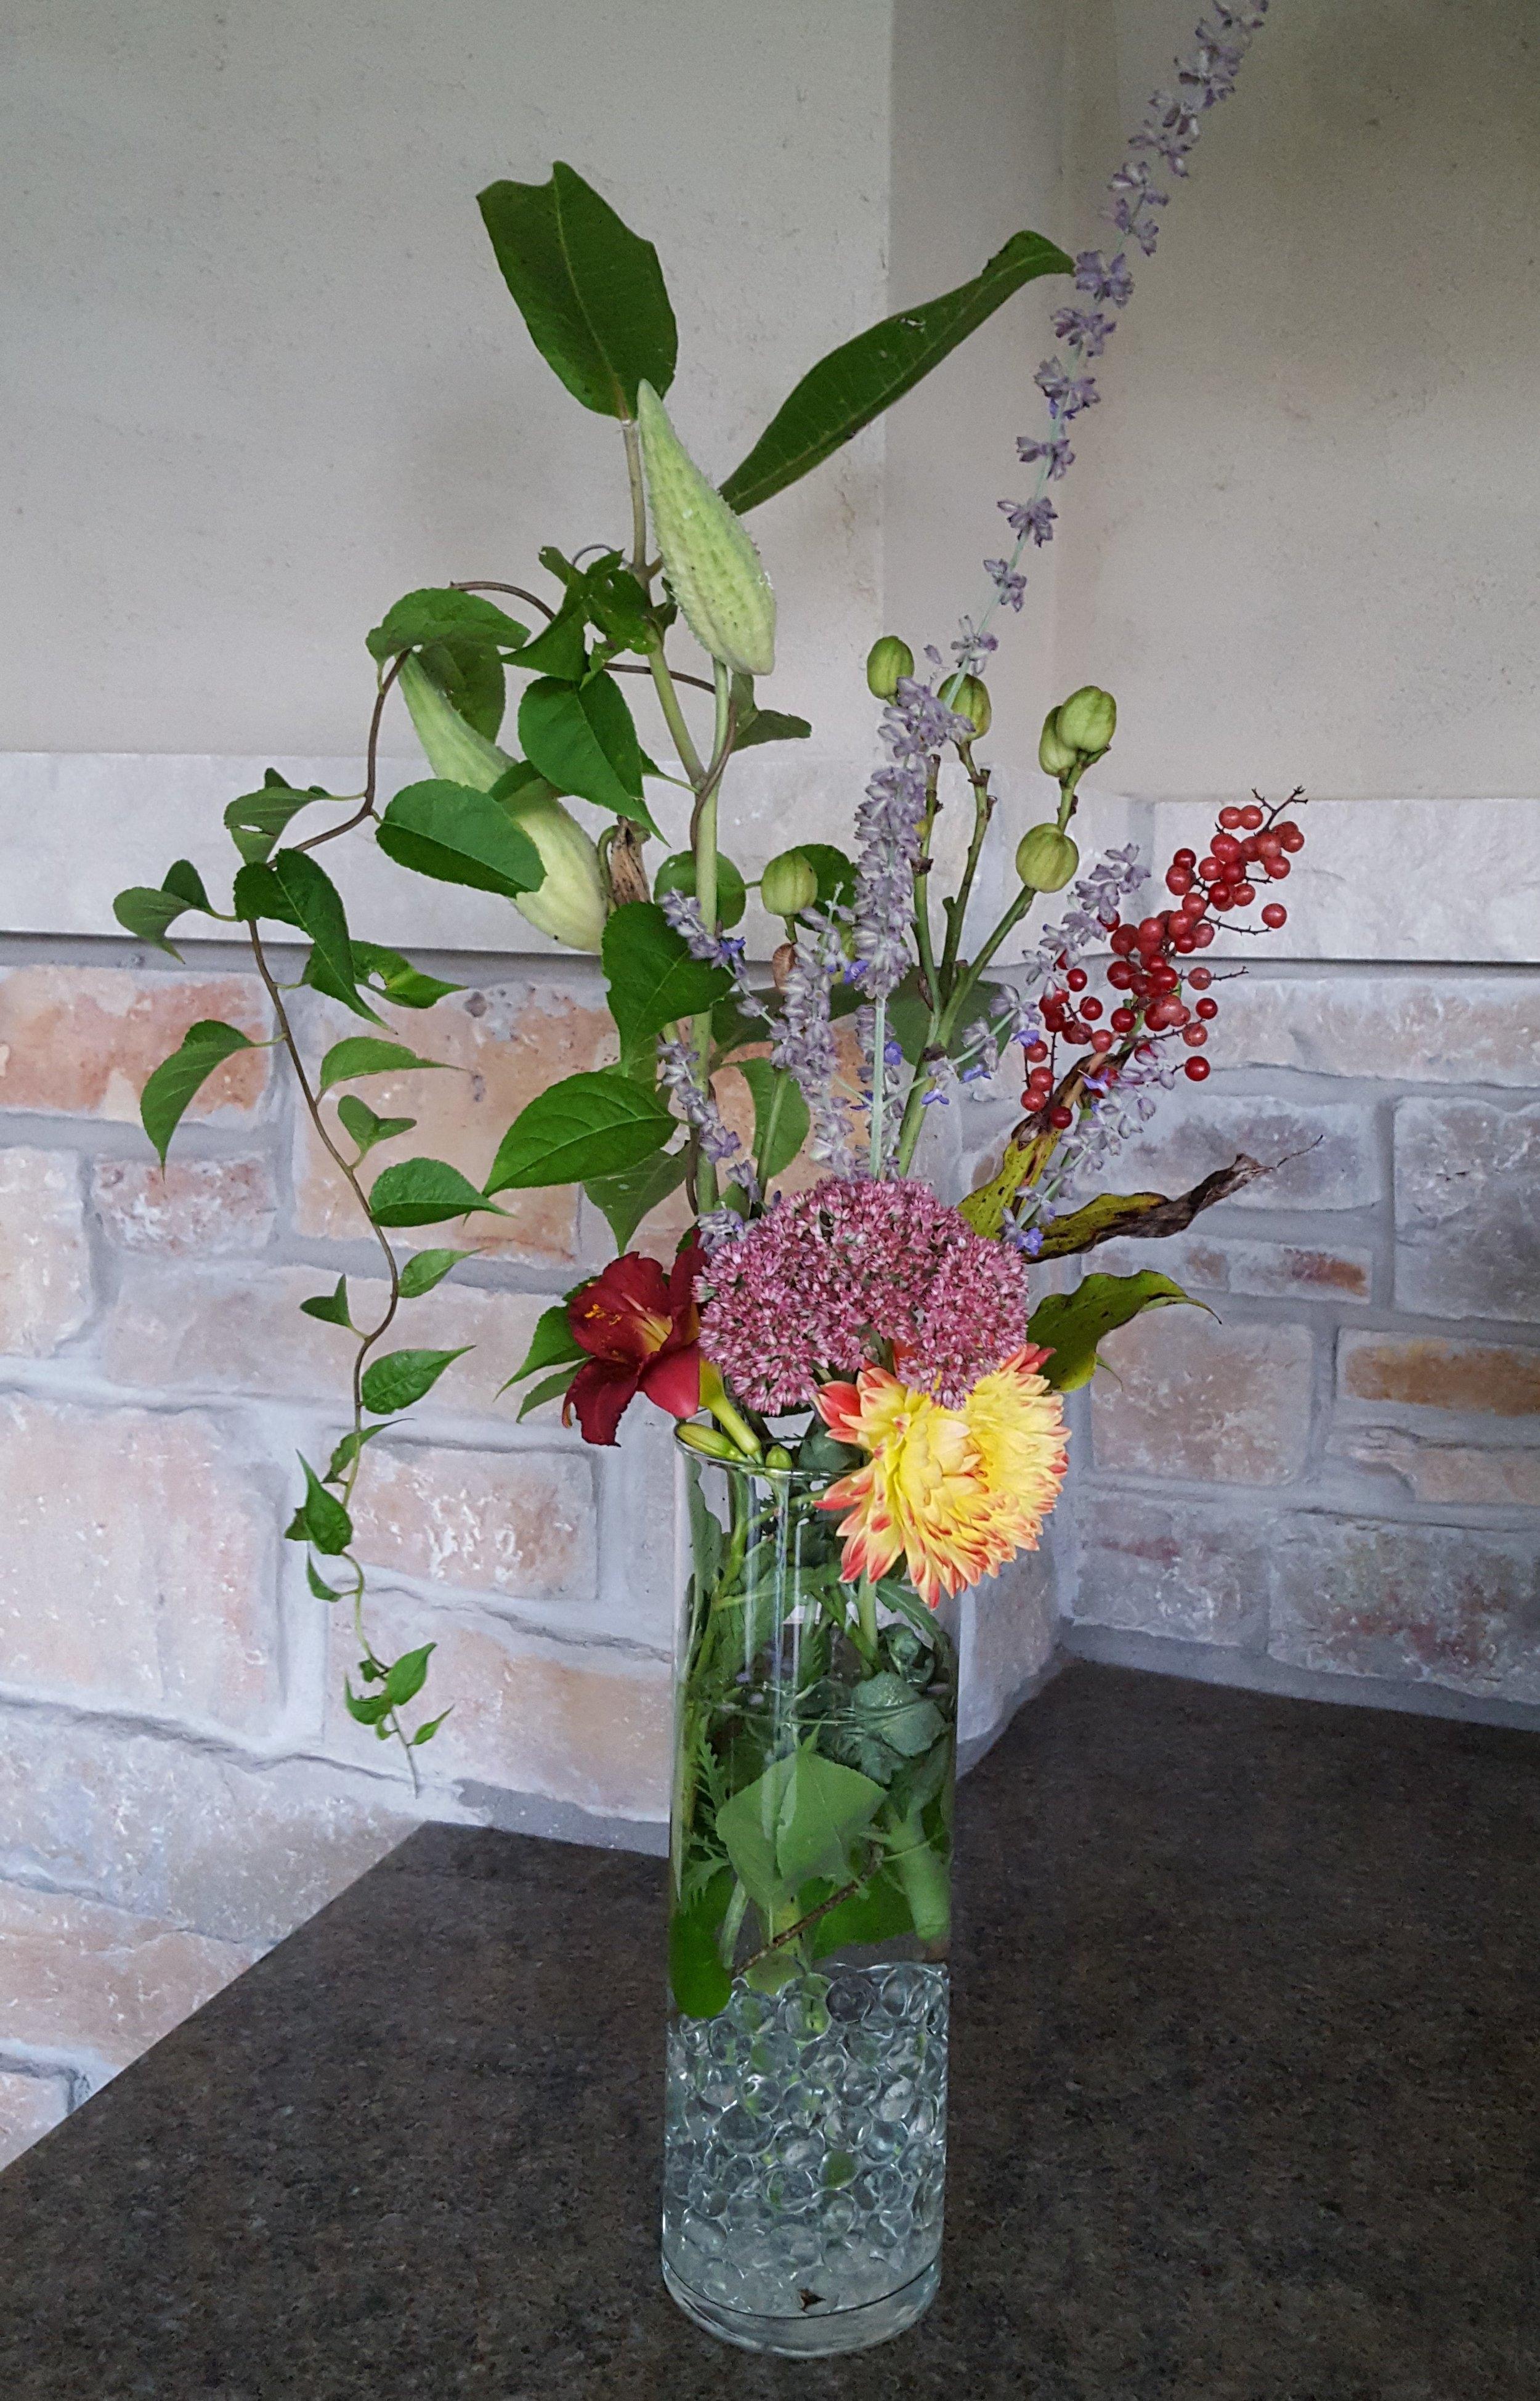 Autumn bouquet 2 9.7.18.jpg